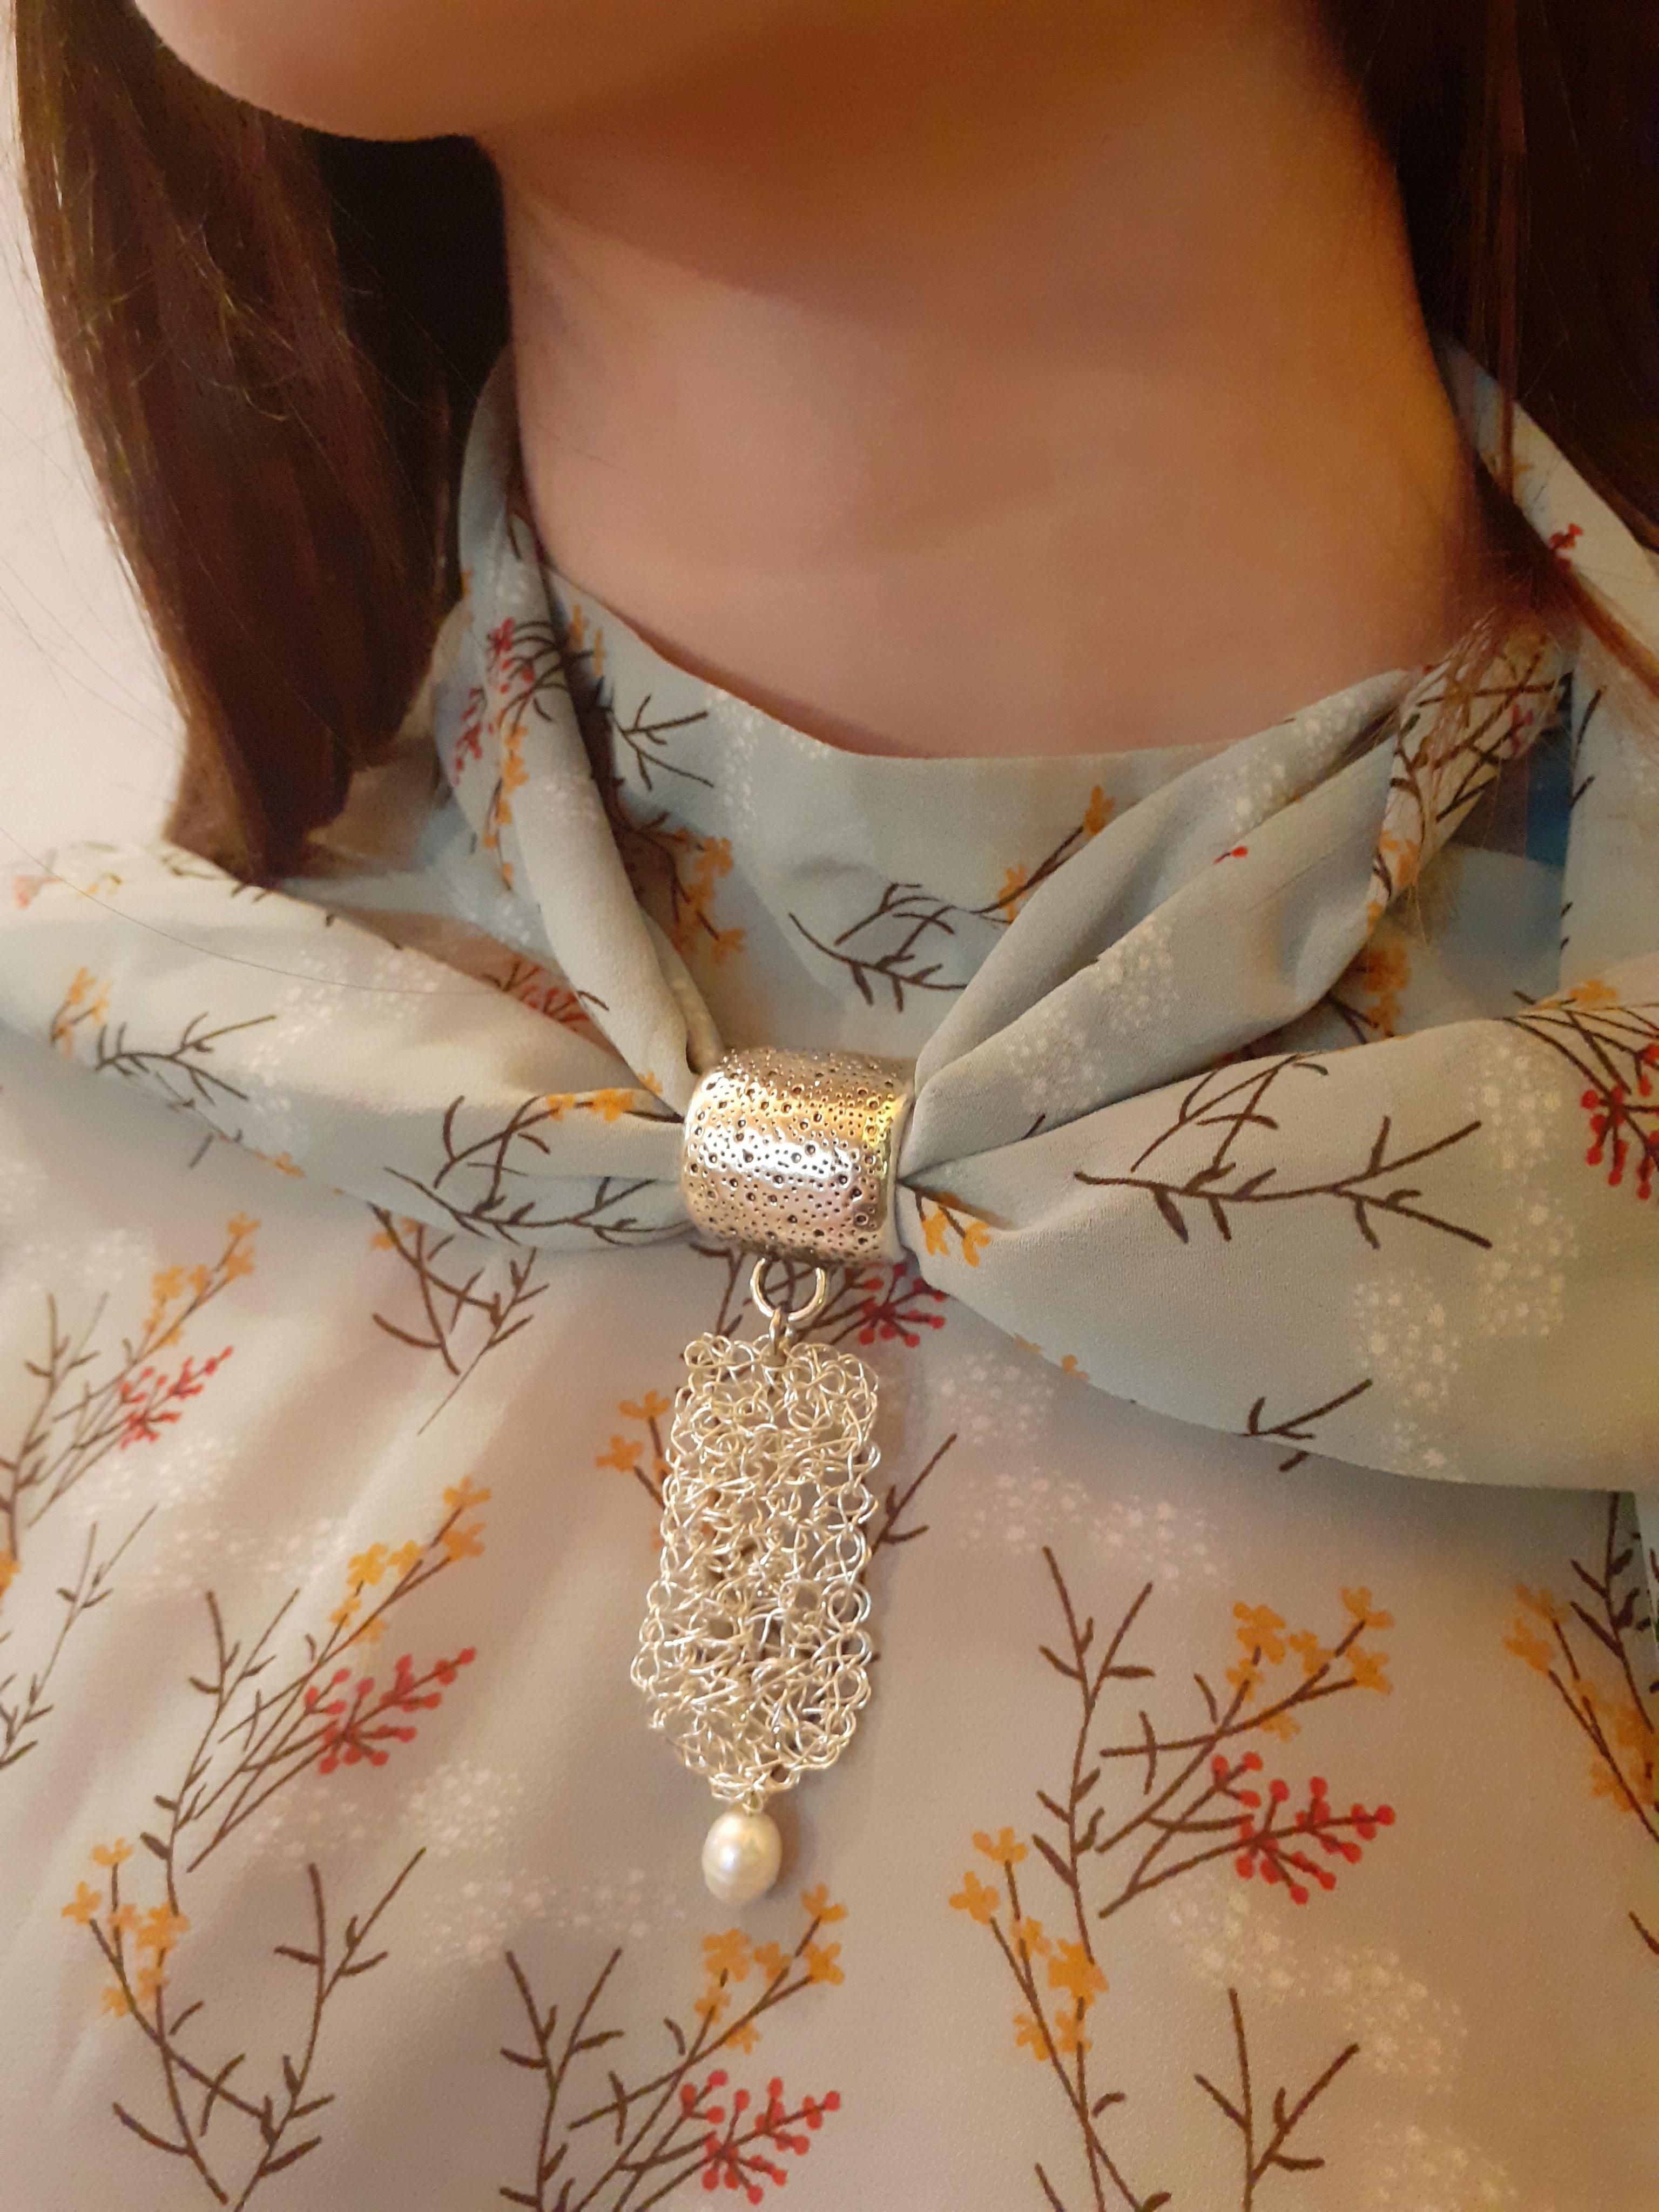 Gioiello per Foulard | Gioielli artigianali shop online